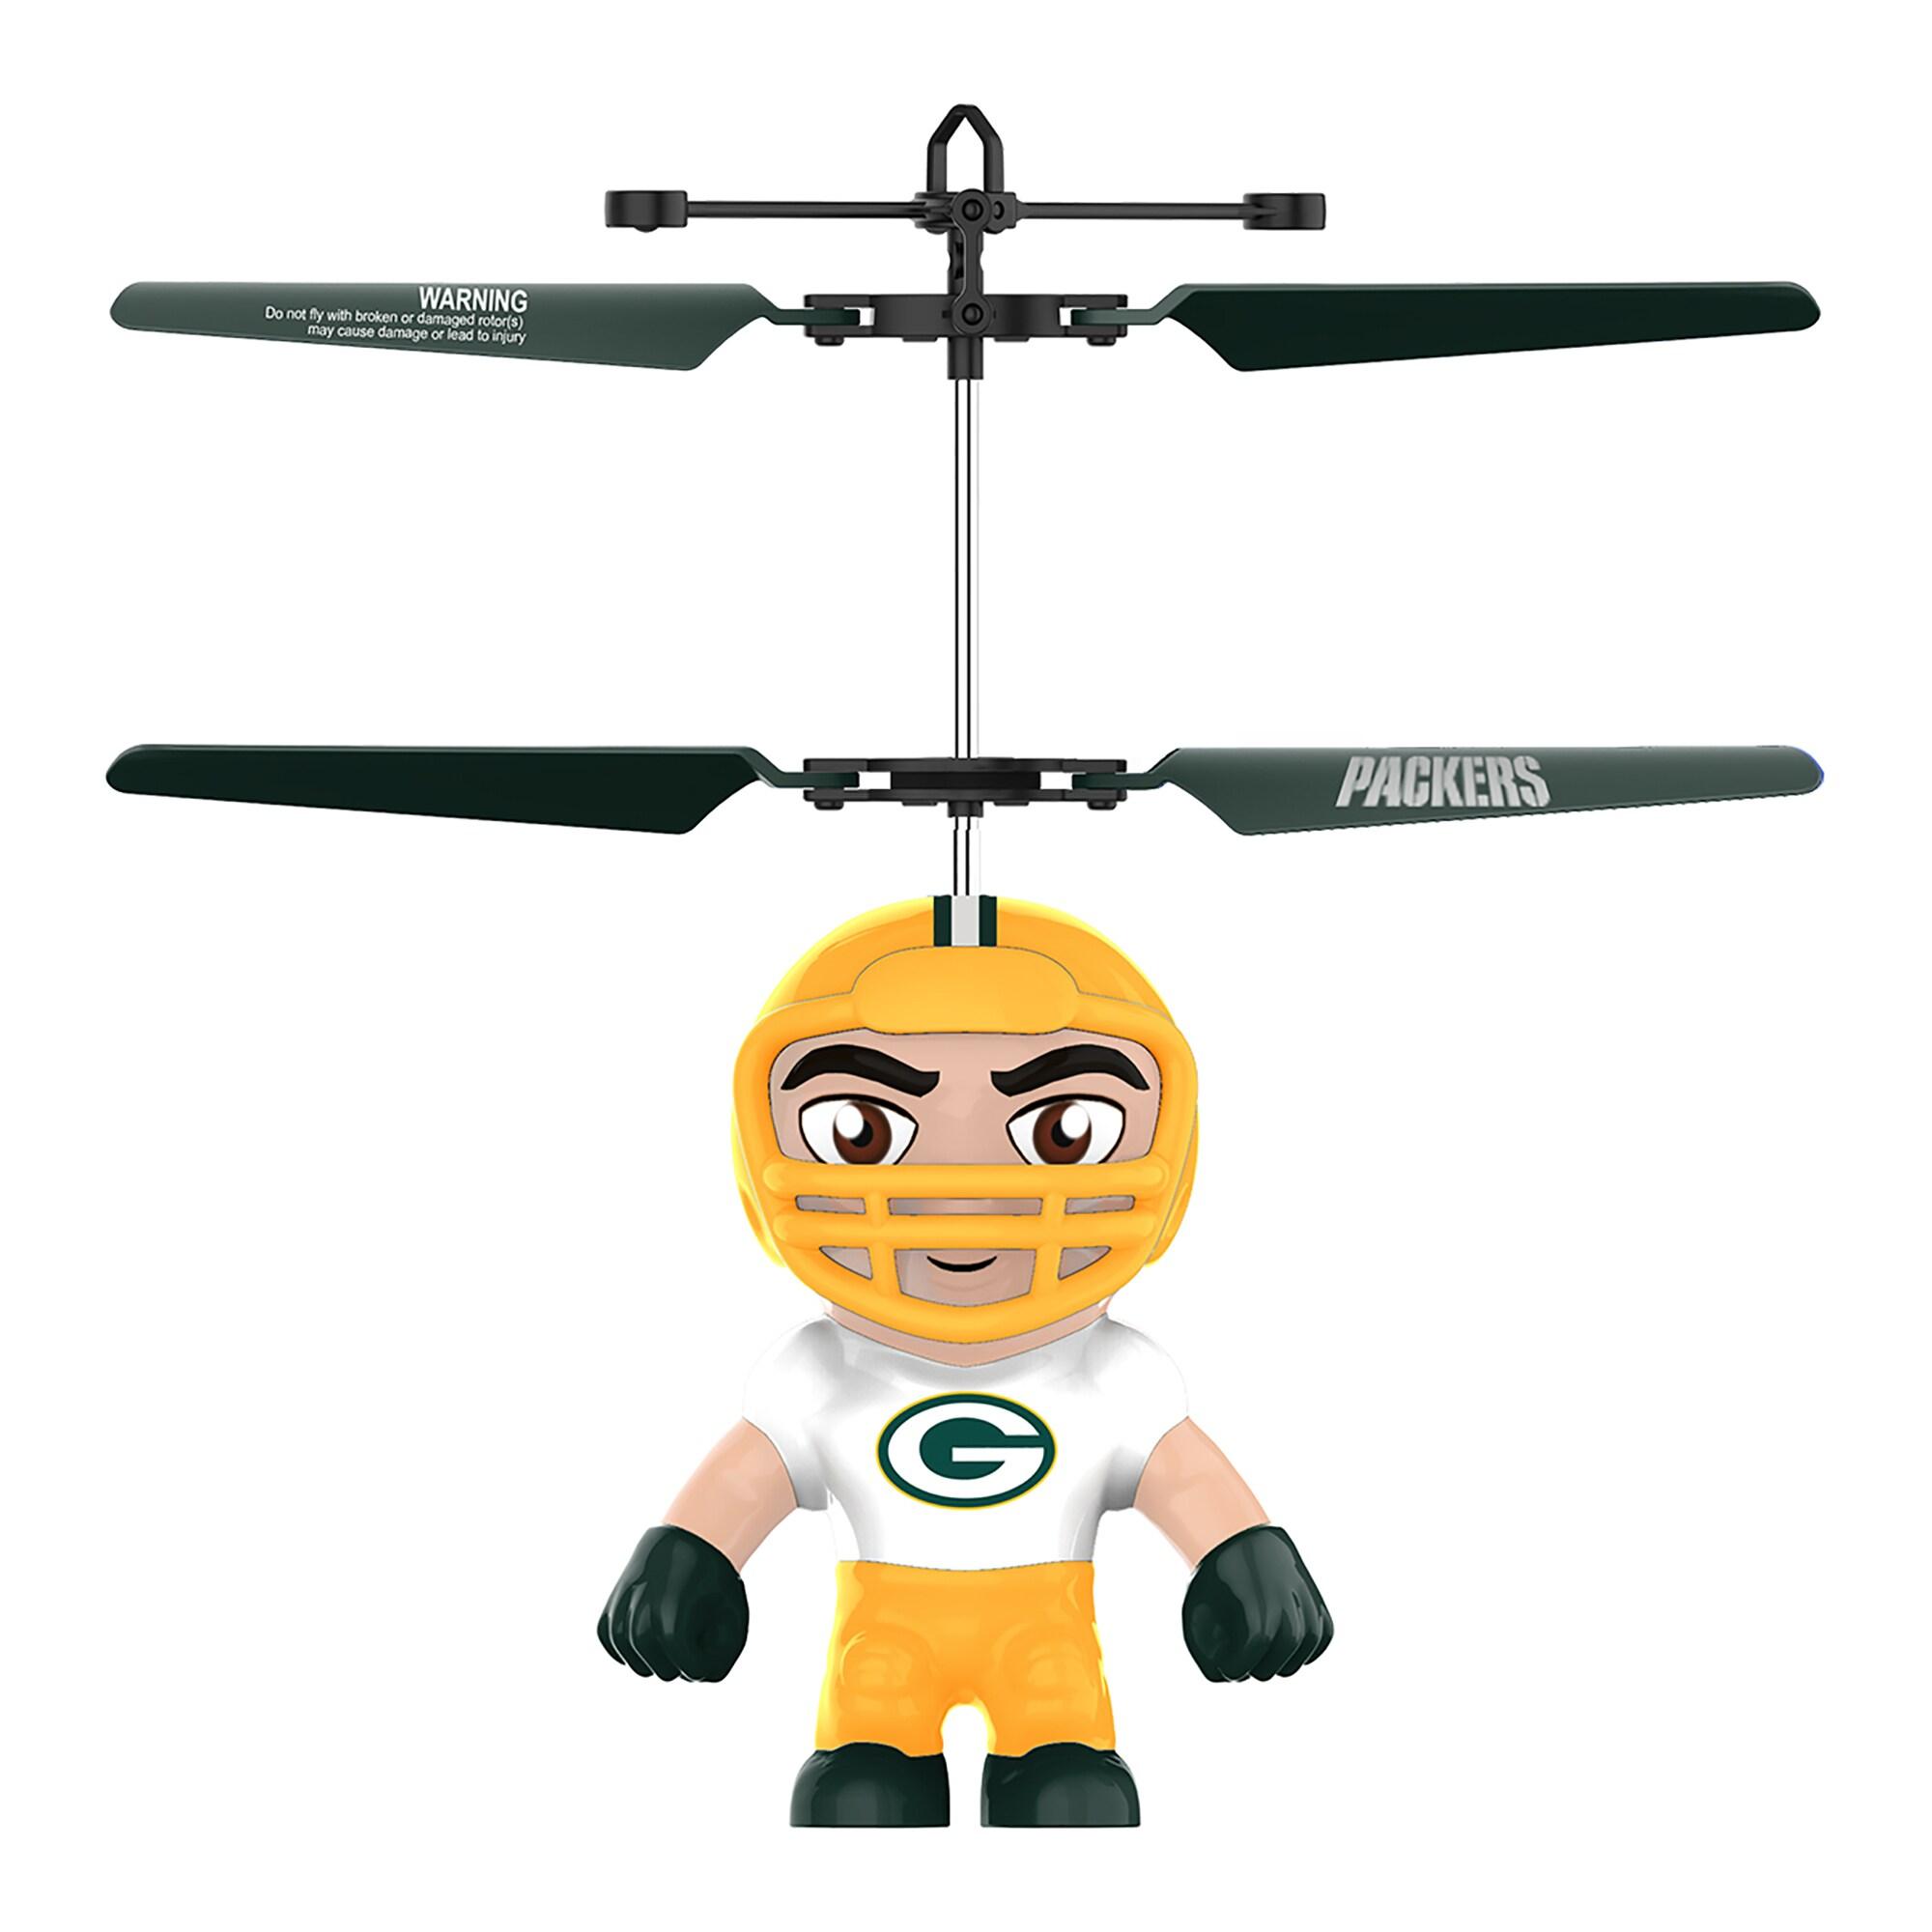 Green Bay Packers Hand-Sensor Figure Flyer